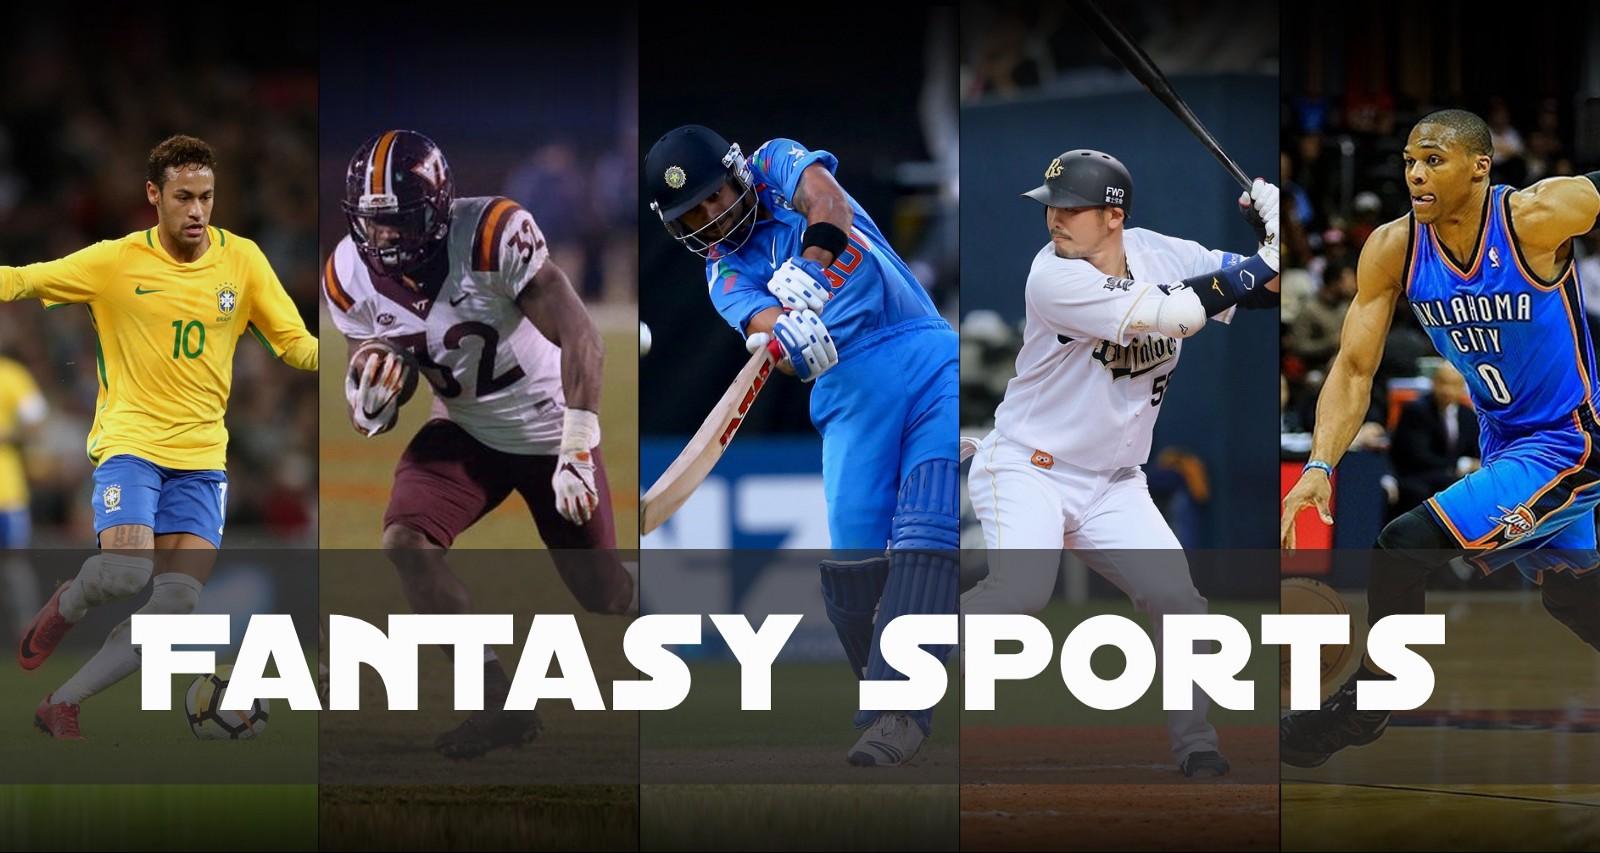 /top-10-fantasy-sports-app-development-companies-927d508fe532 feature image